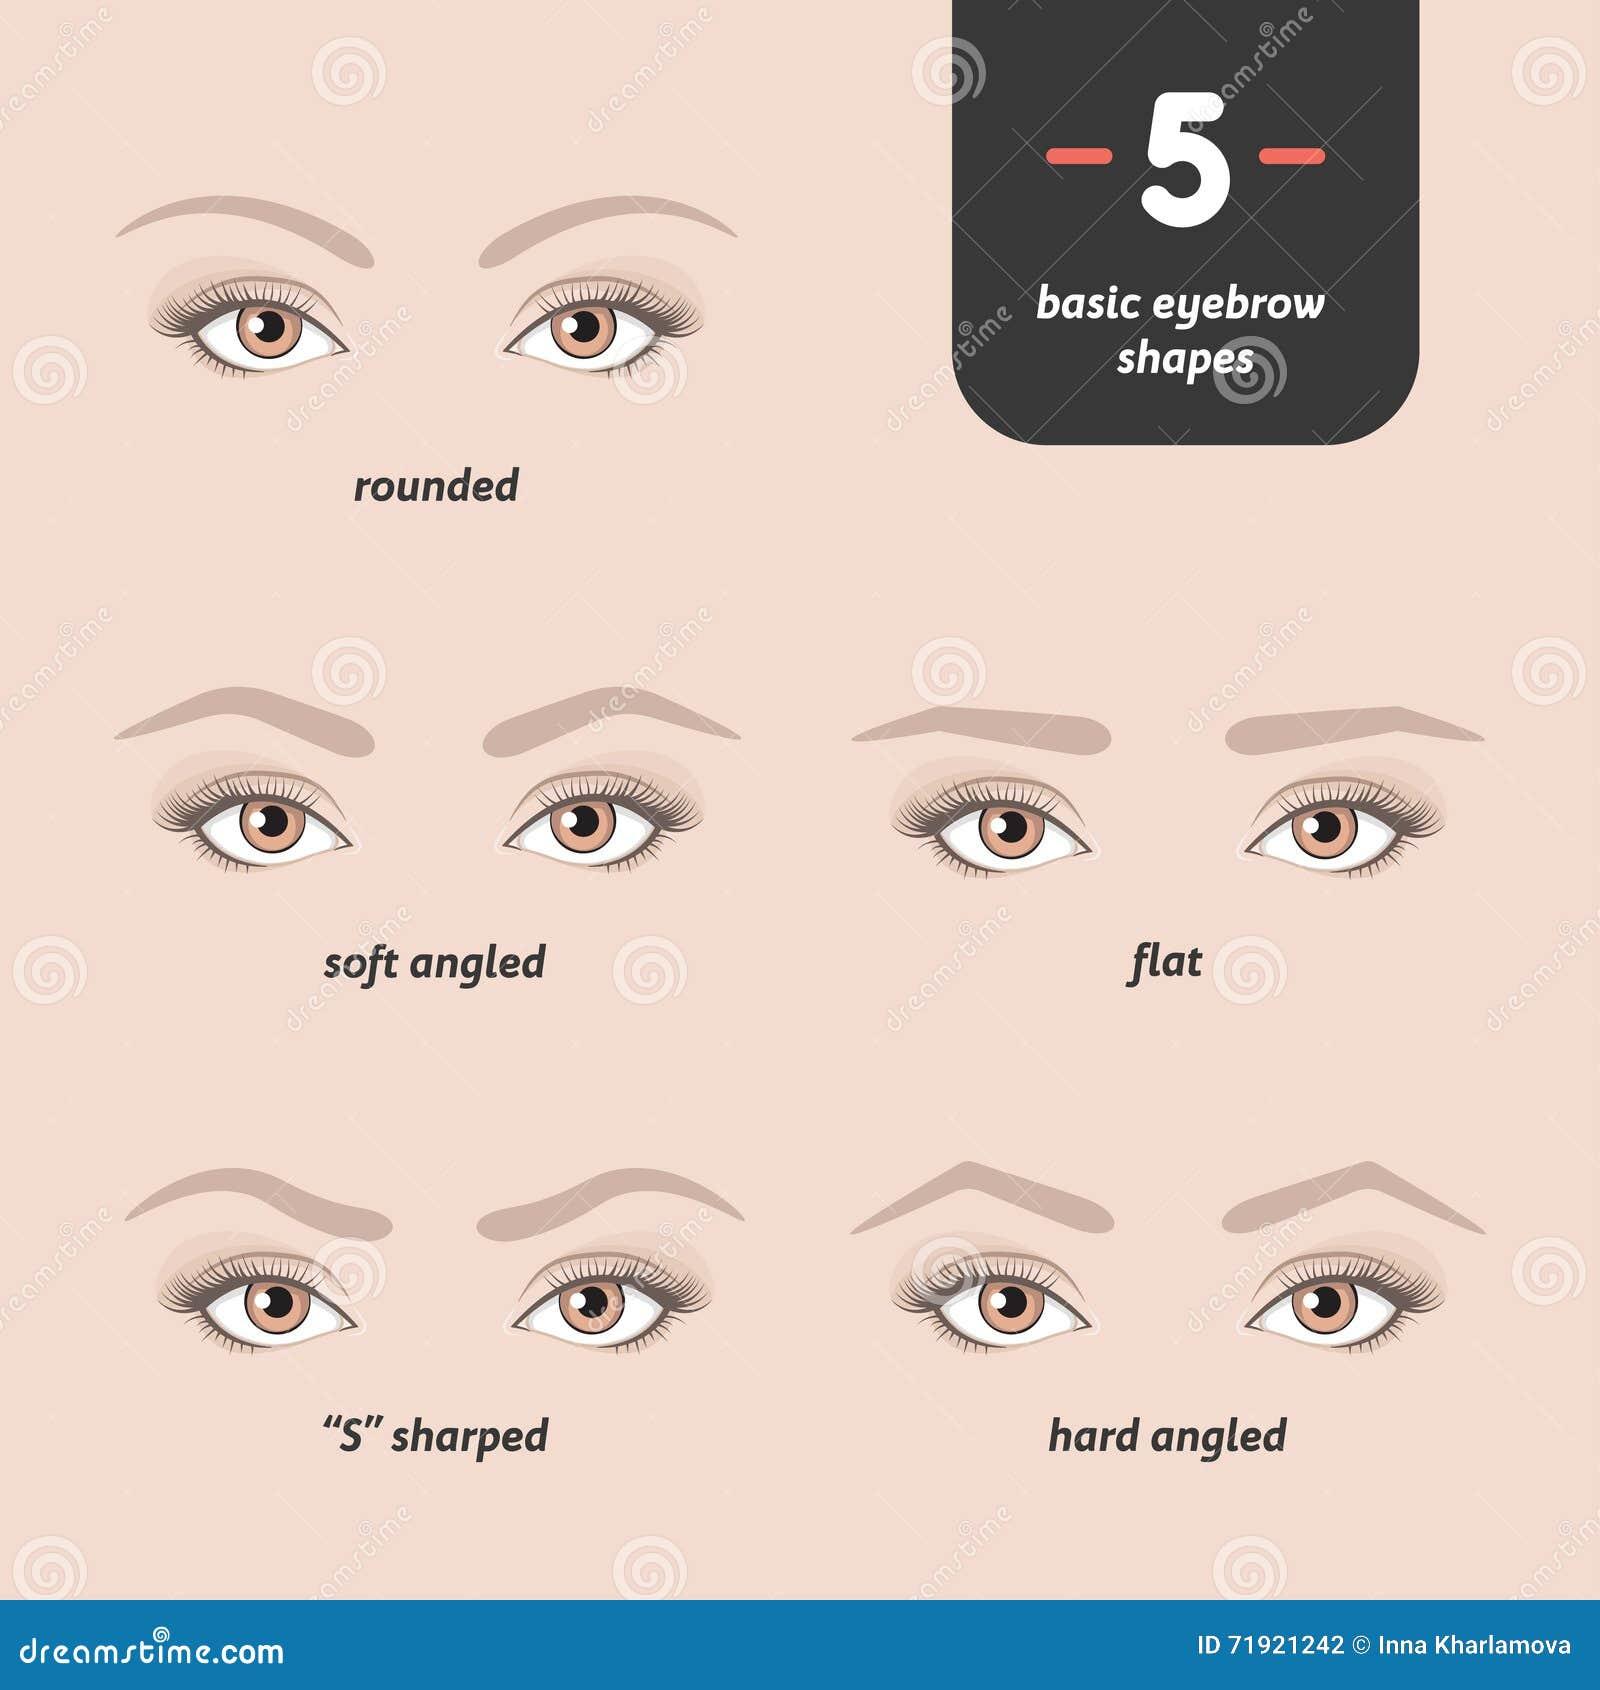 5 Basic Eyebrow Shapes Stock Vector Illustration Of Illustration